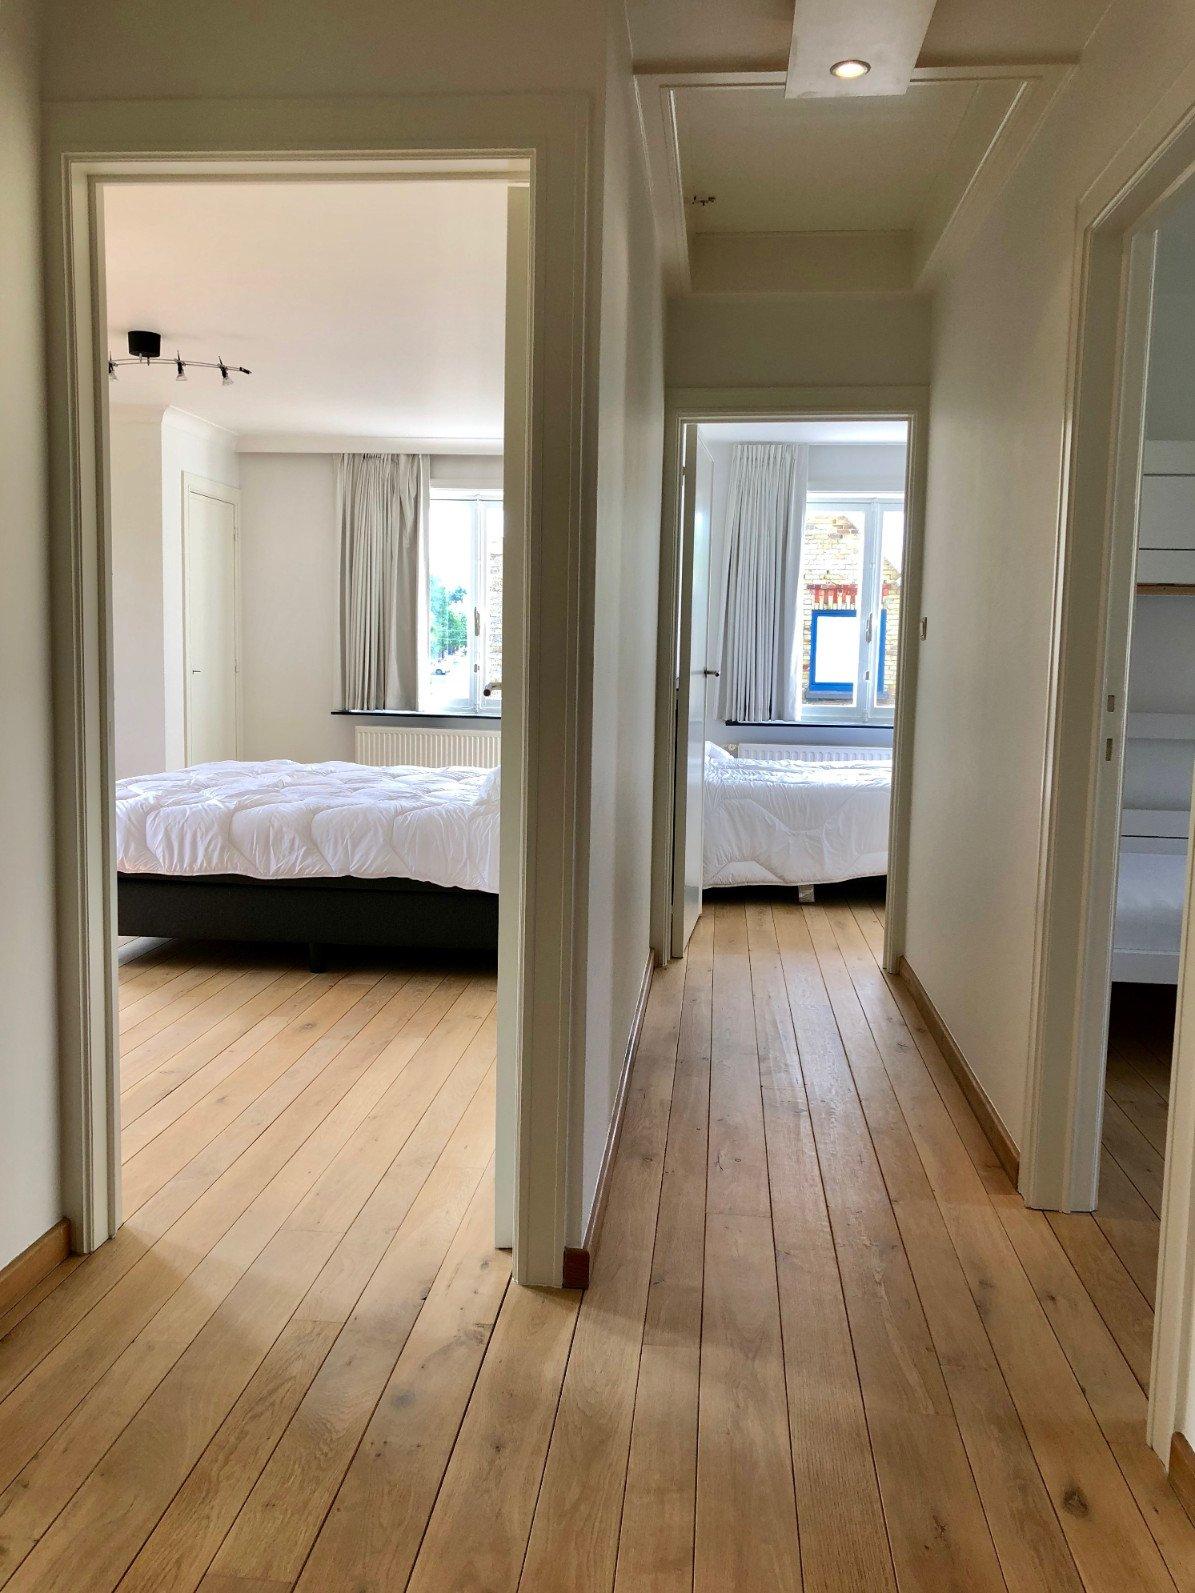 Rietveldprojects-Villa Were Di - Te Koop : Te Huur (per week)15.jpg